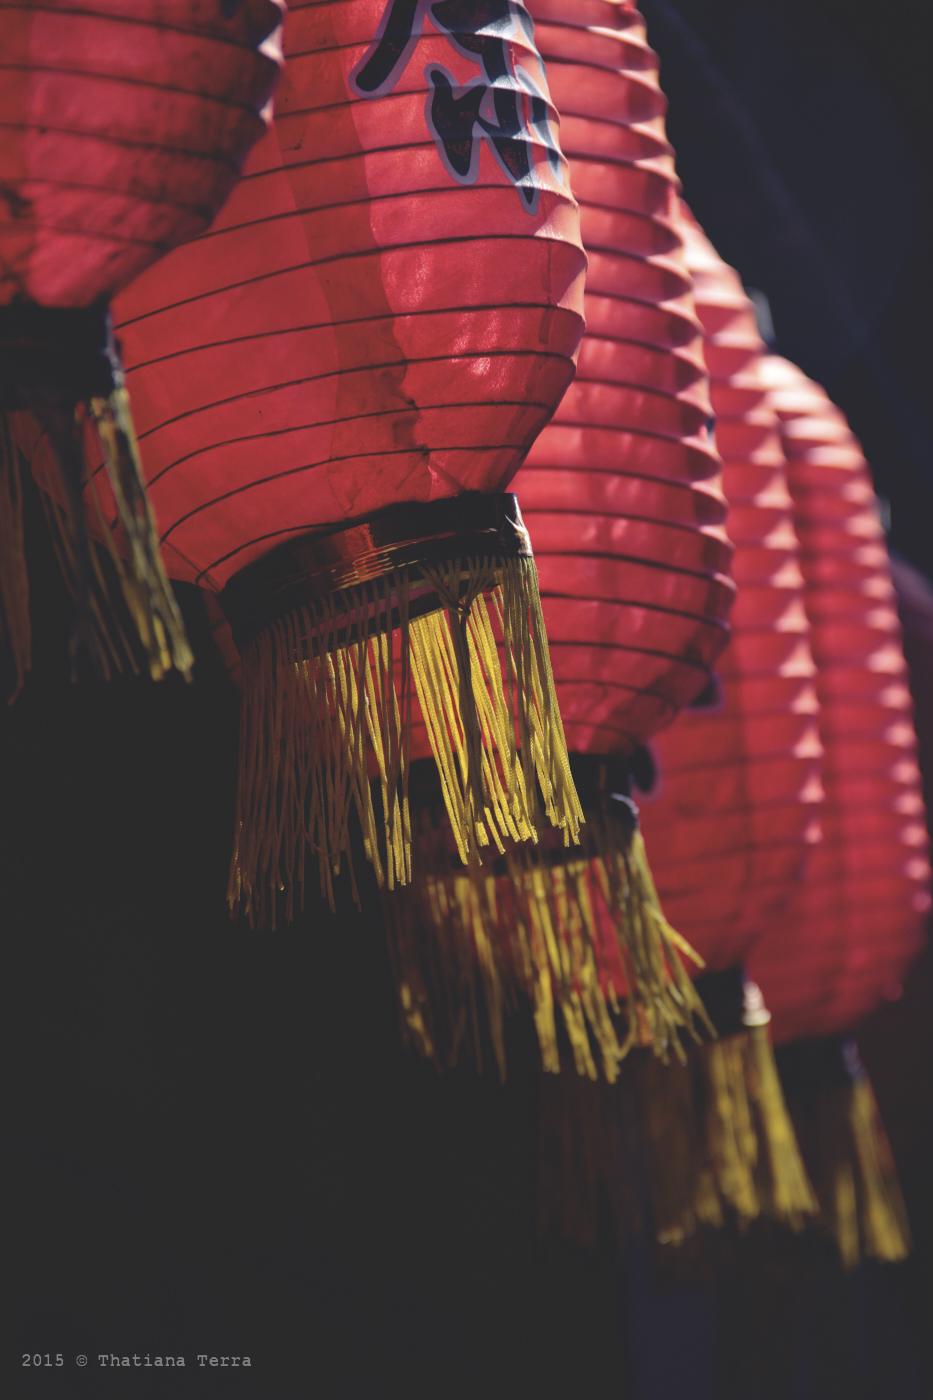 China: Qibao watertown in details (7)